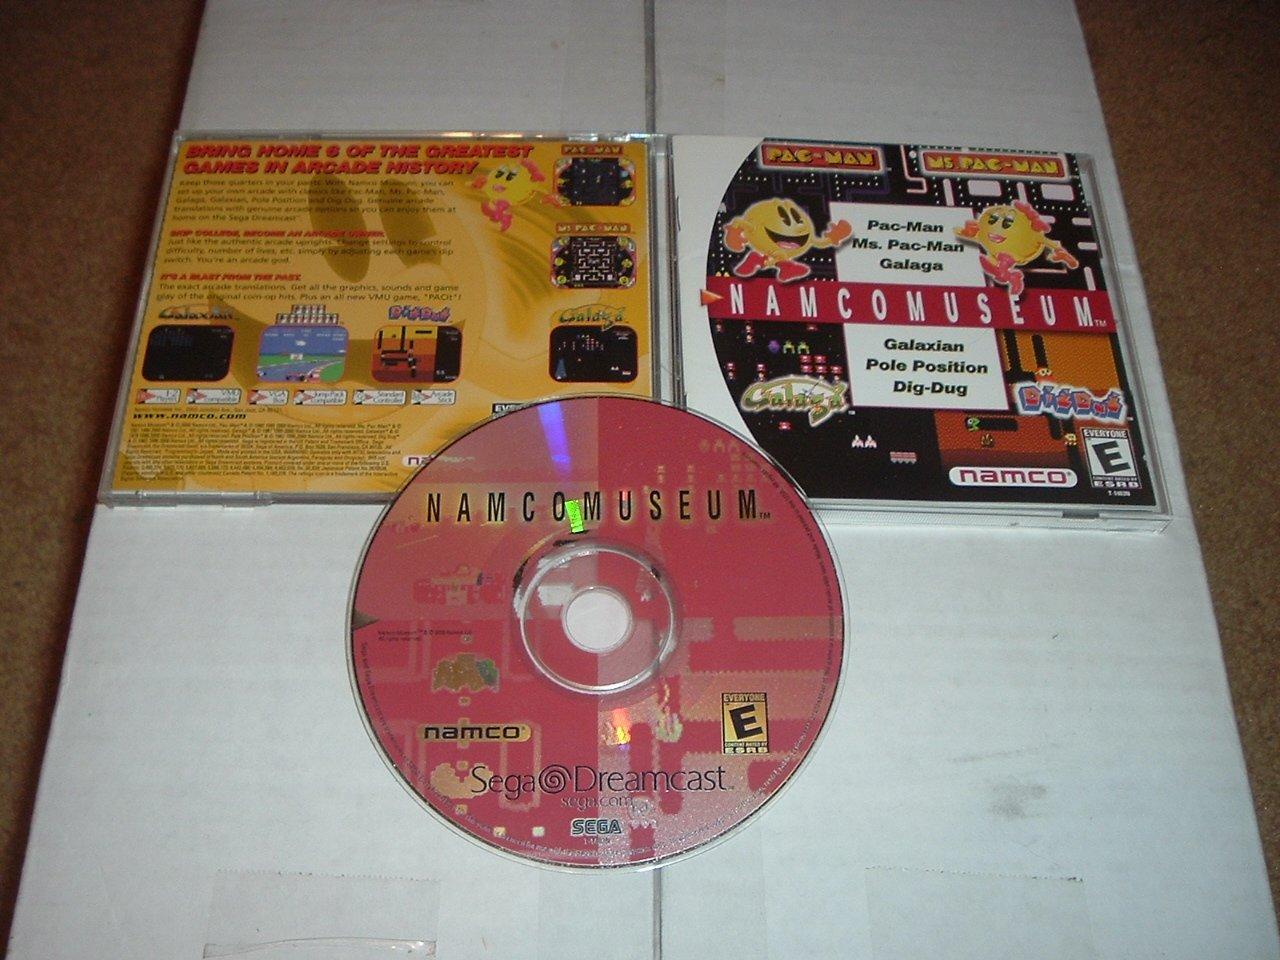 Namco Museum (Sega Dreamcast) COMPLETE 6 arcade games in 1 anthology namcomuseum, For Sale